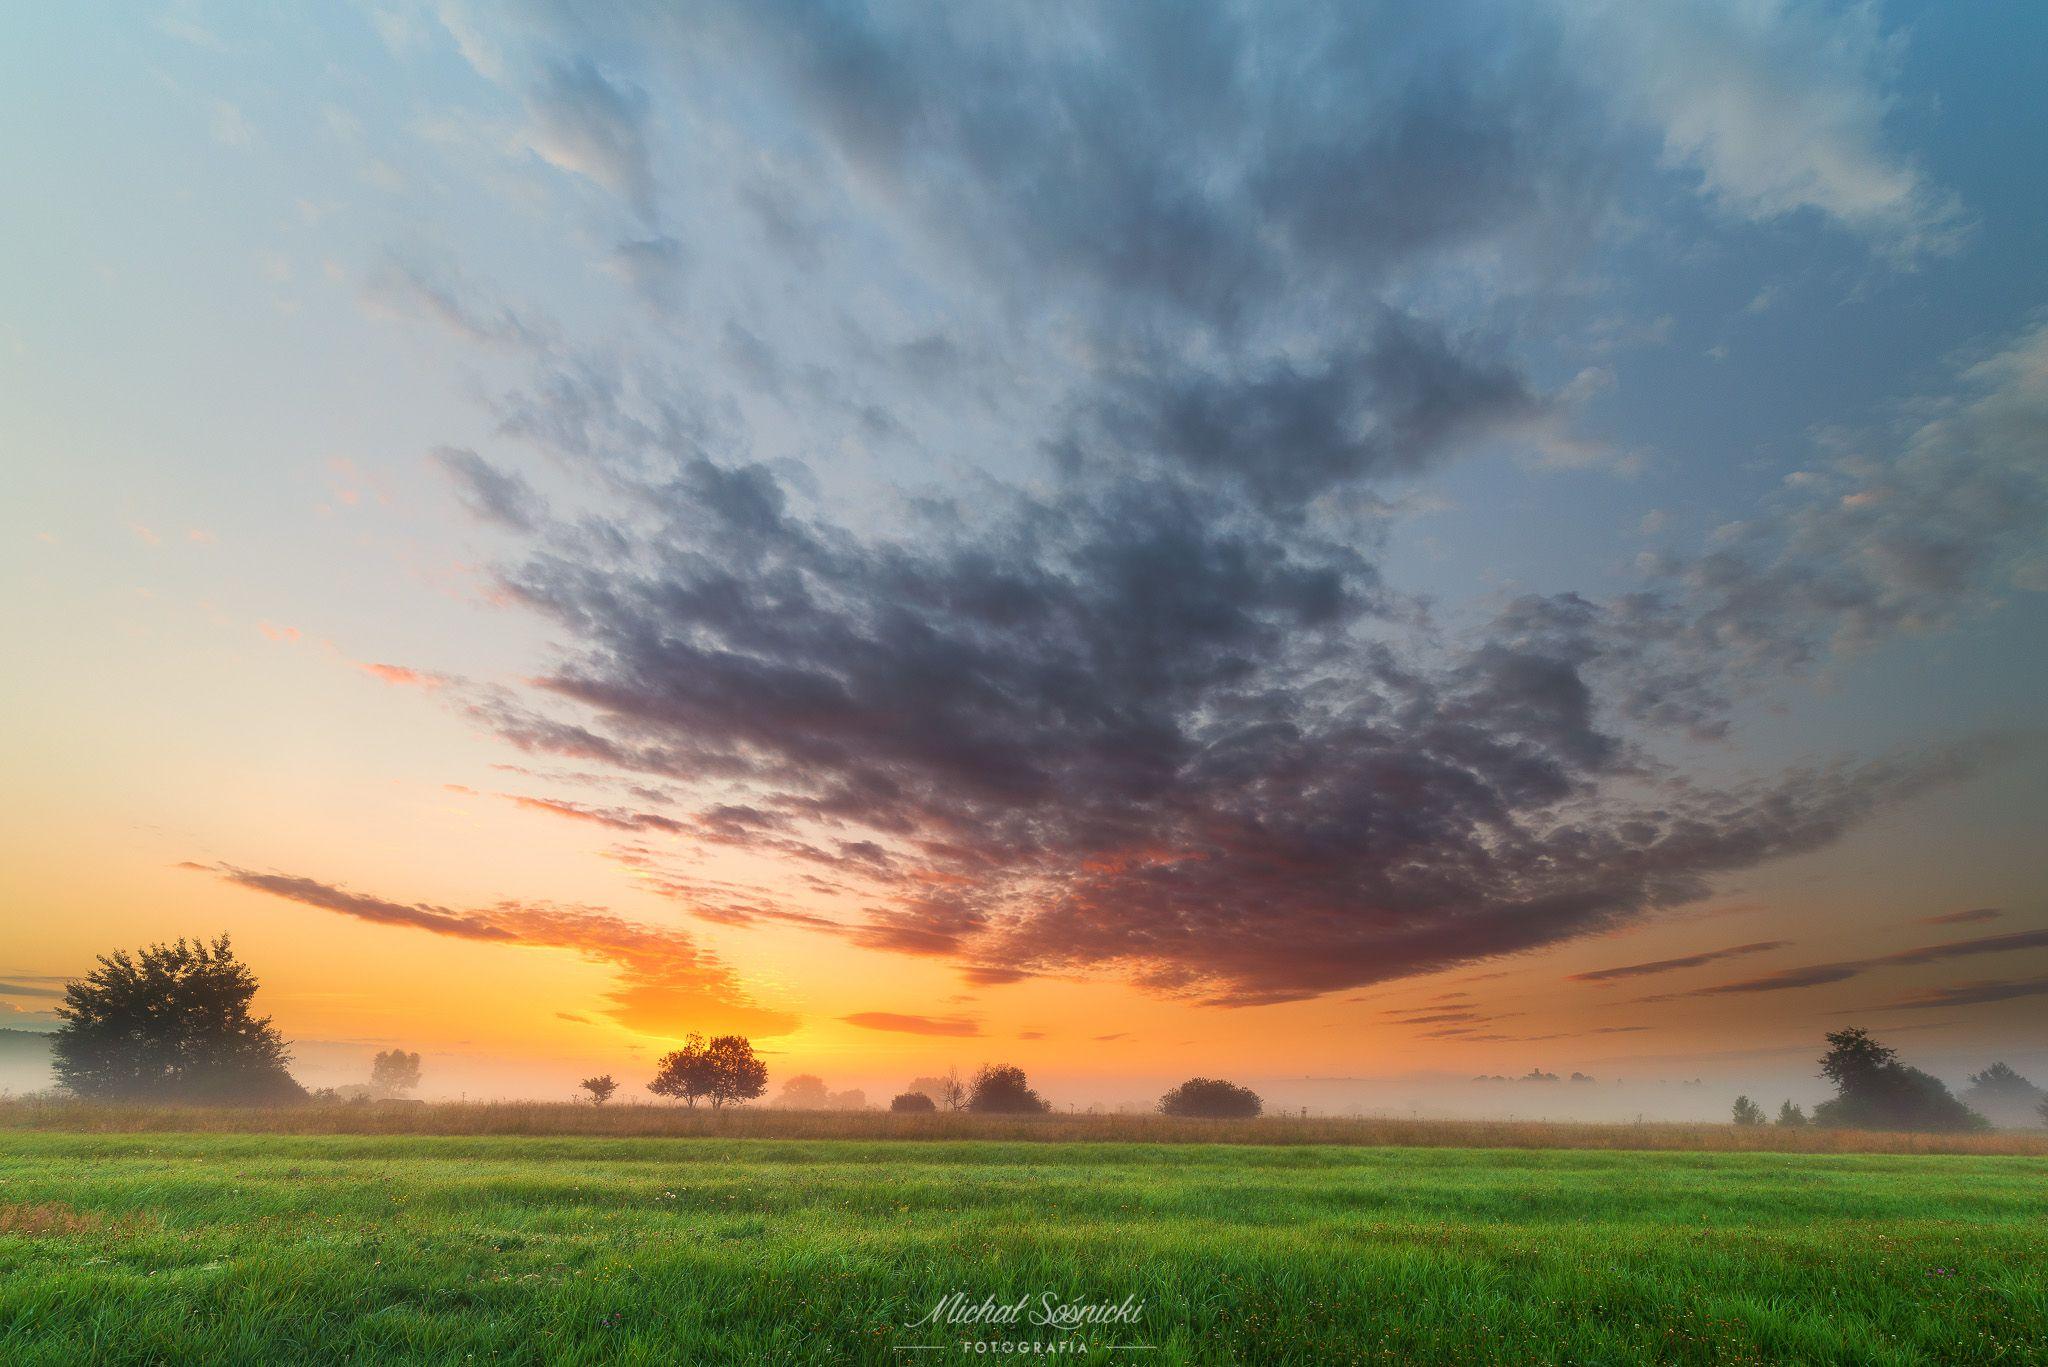 #poland #summer #morning #sunrise #pentax #benro #sky #best #nature, Sośnicki Michał